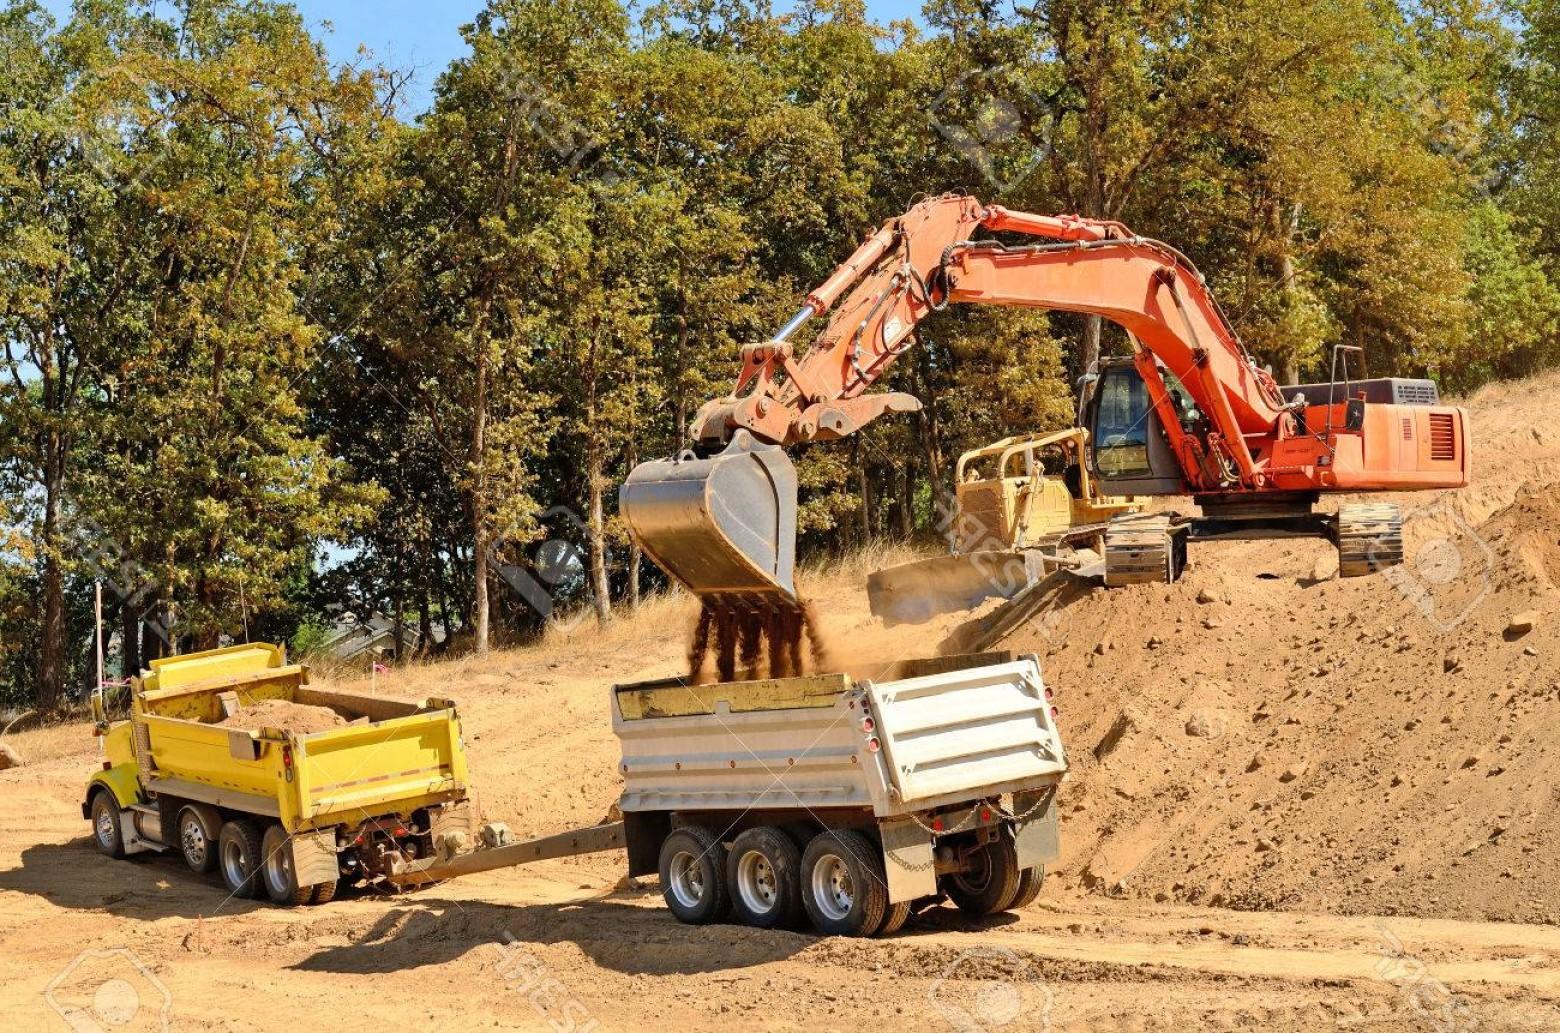 Photolarge track hoe filling. Excavator clipart rock quarry